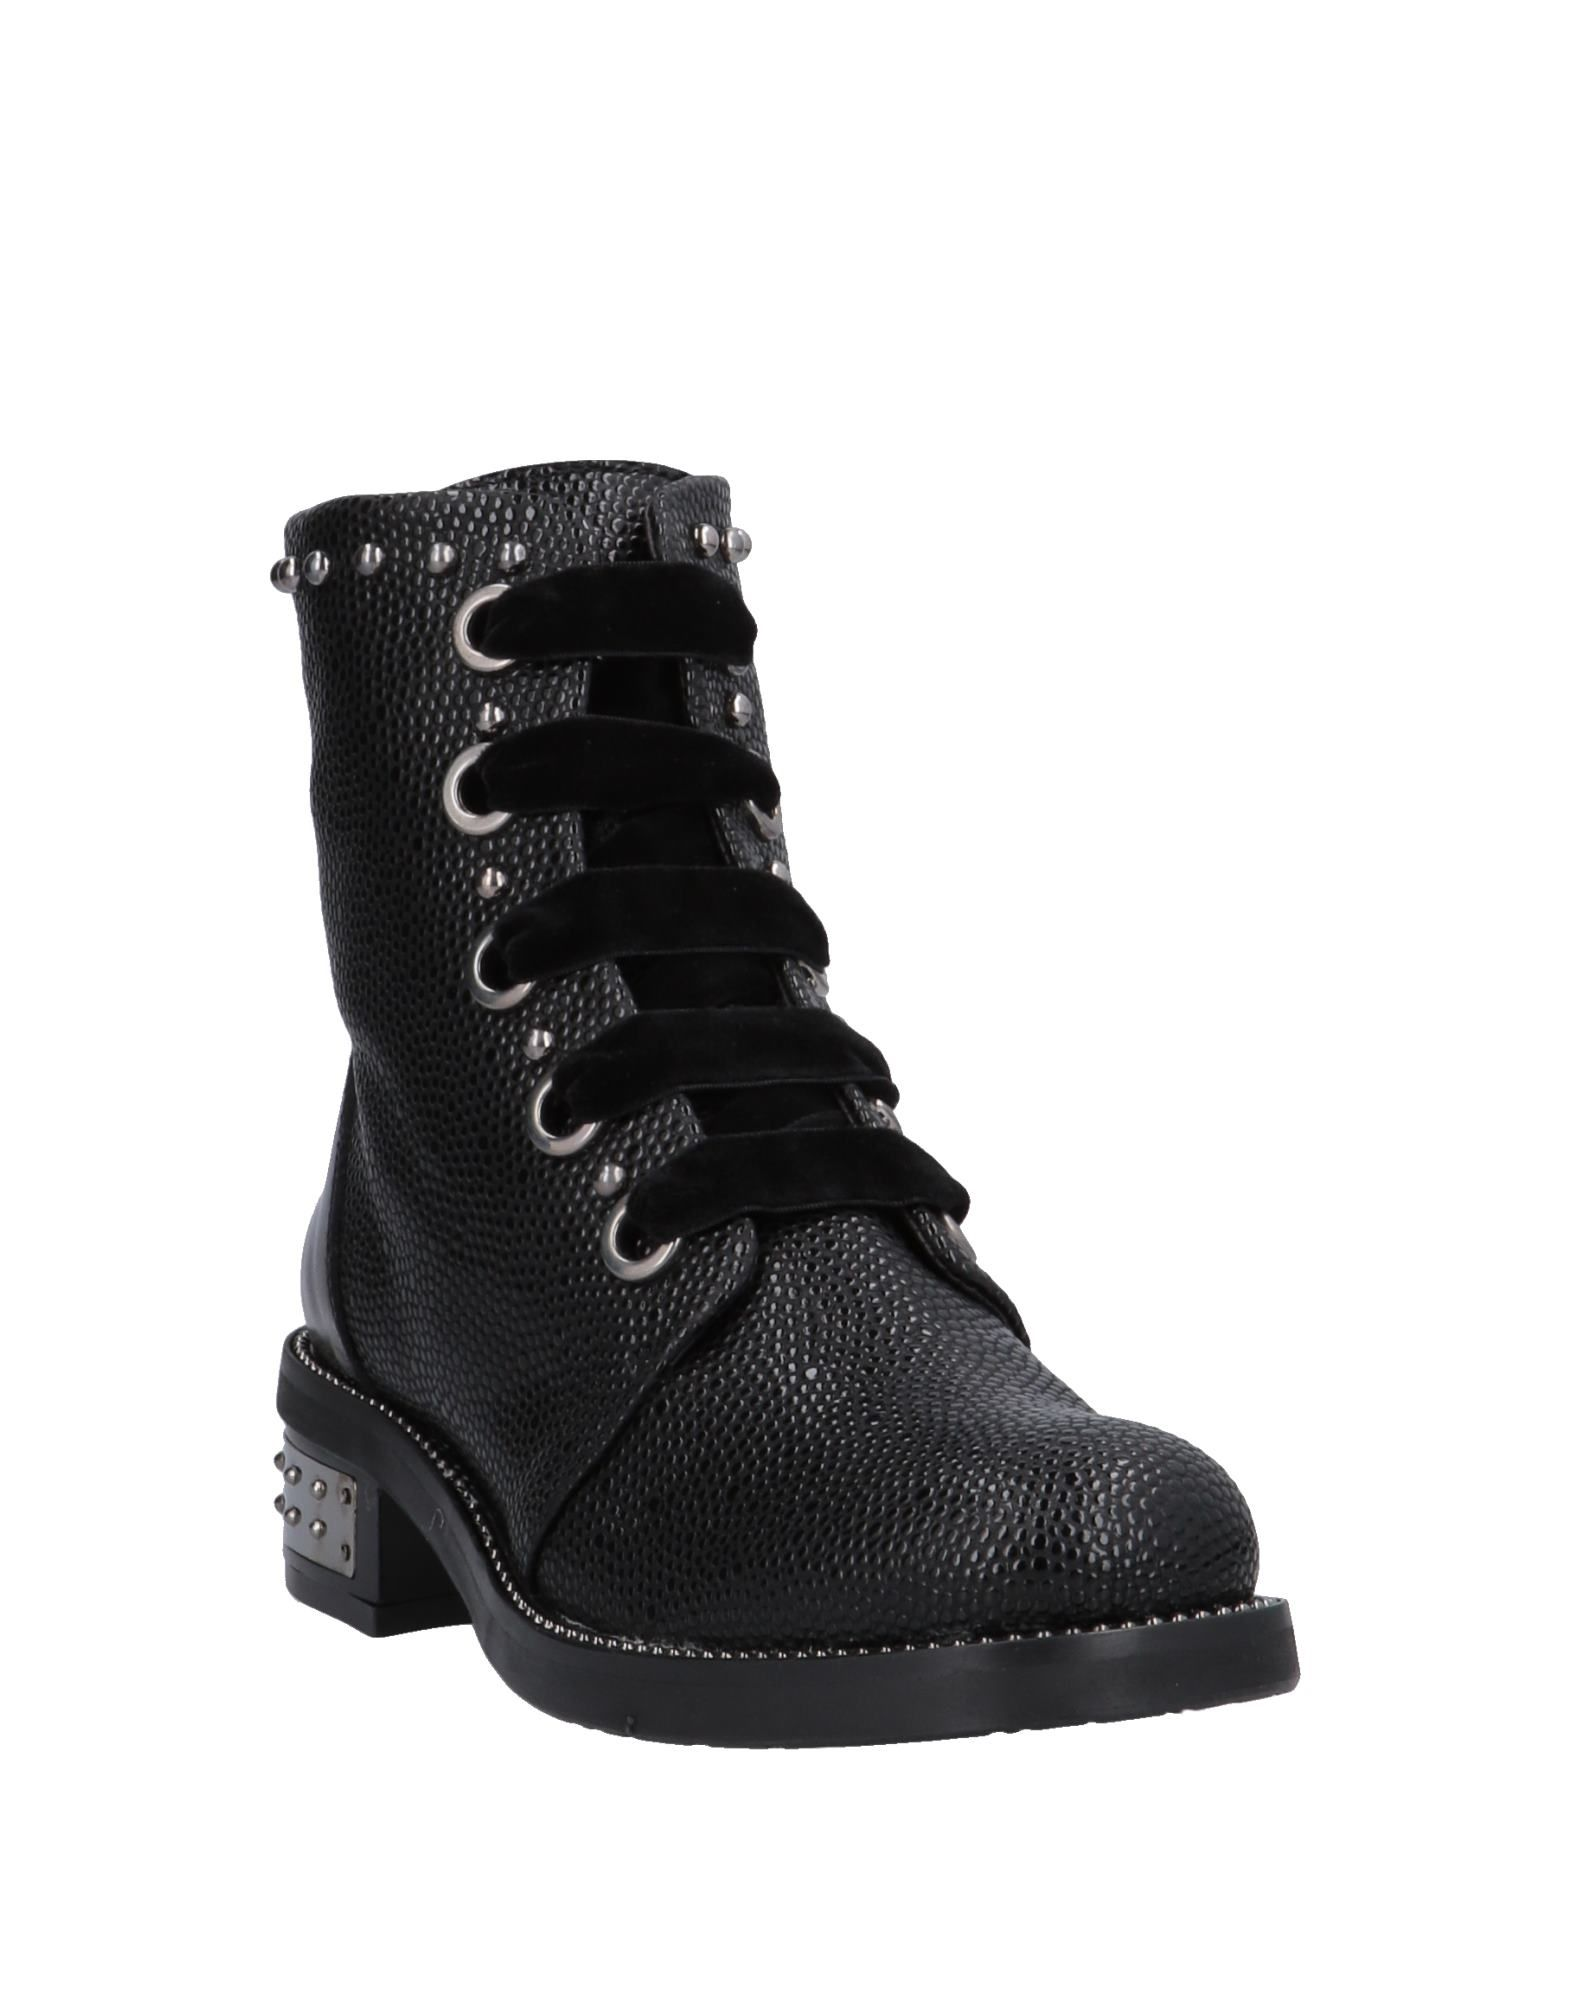 Rabatt Schuhe 11549744VL Zinda Stiefelette Damen  11549744VL Schuhe 454512